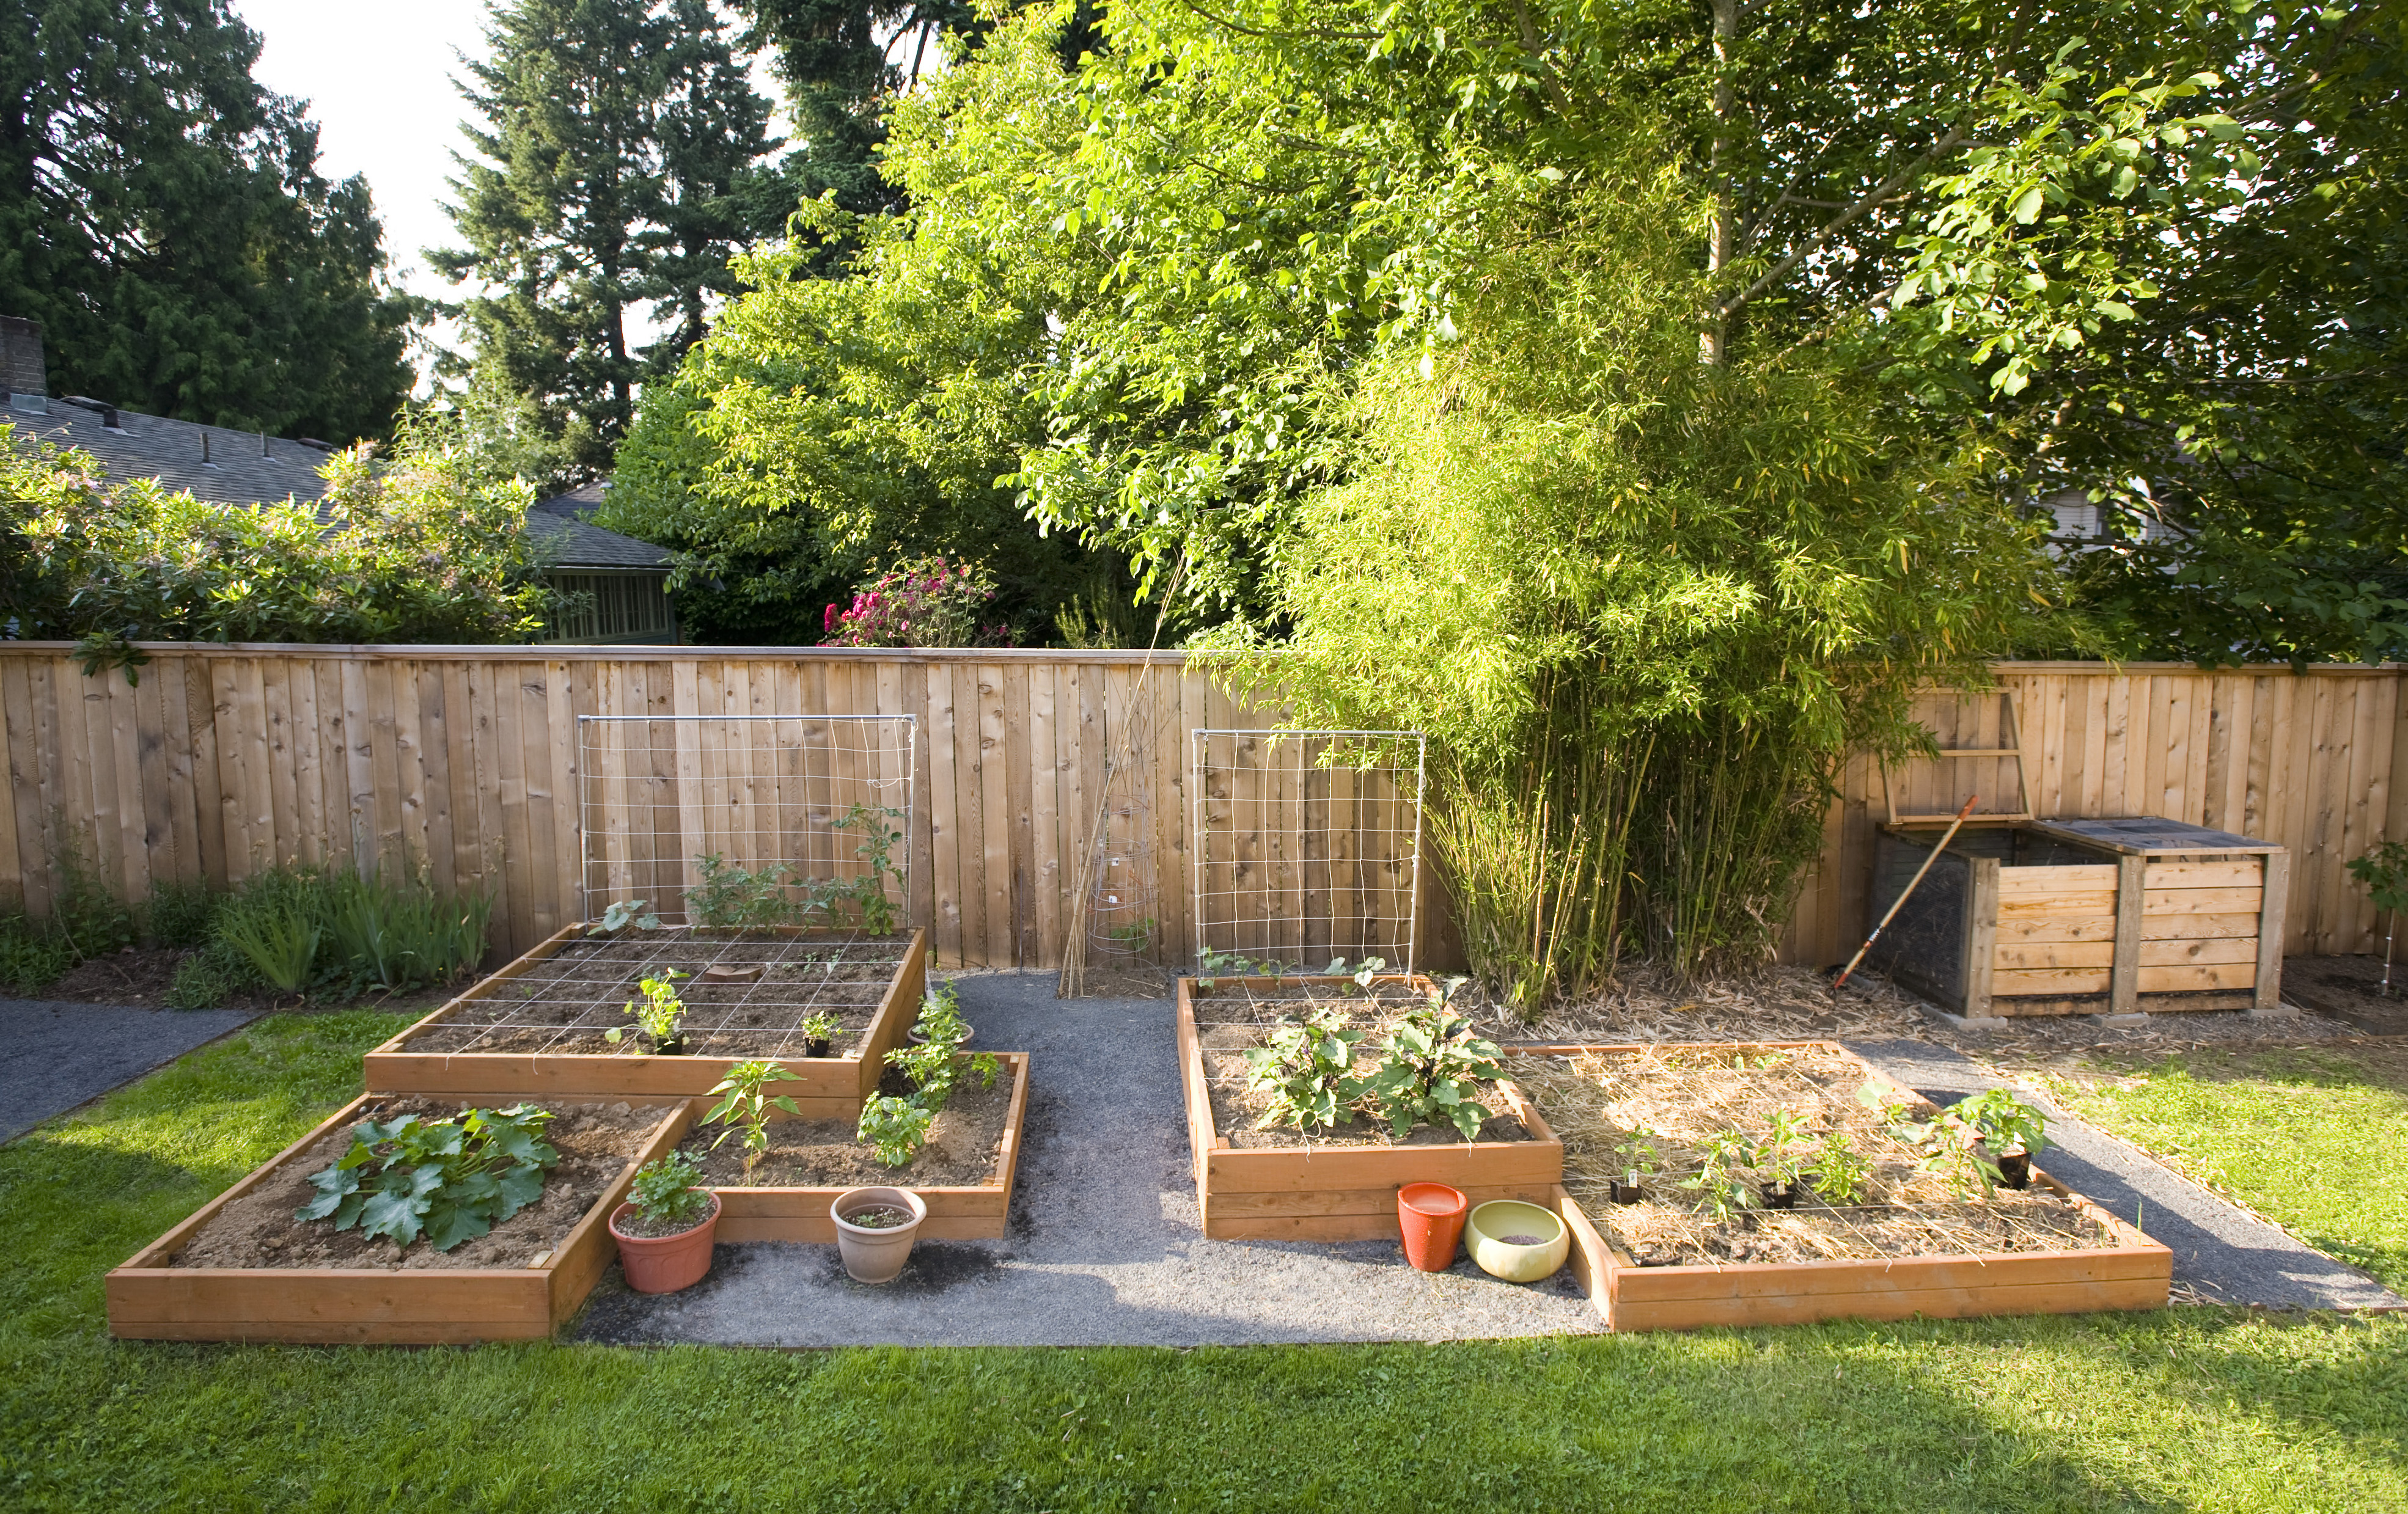 landscape design ideas | Take Root with Dennis\' 7 Dees